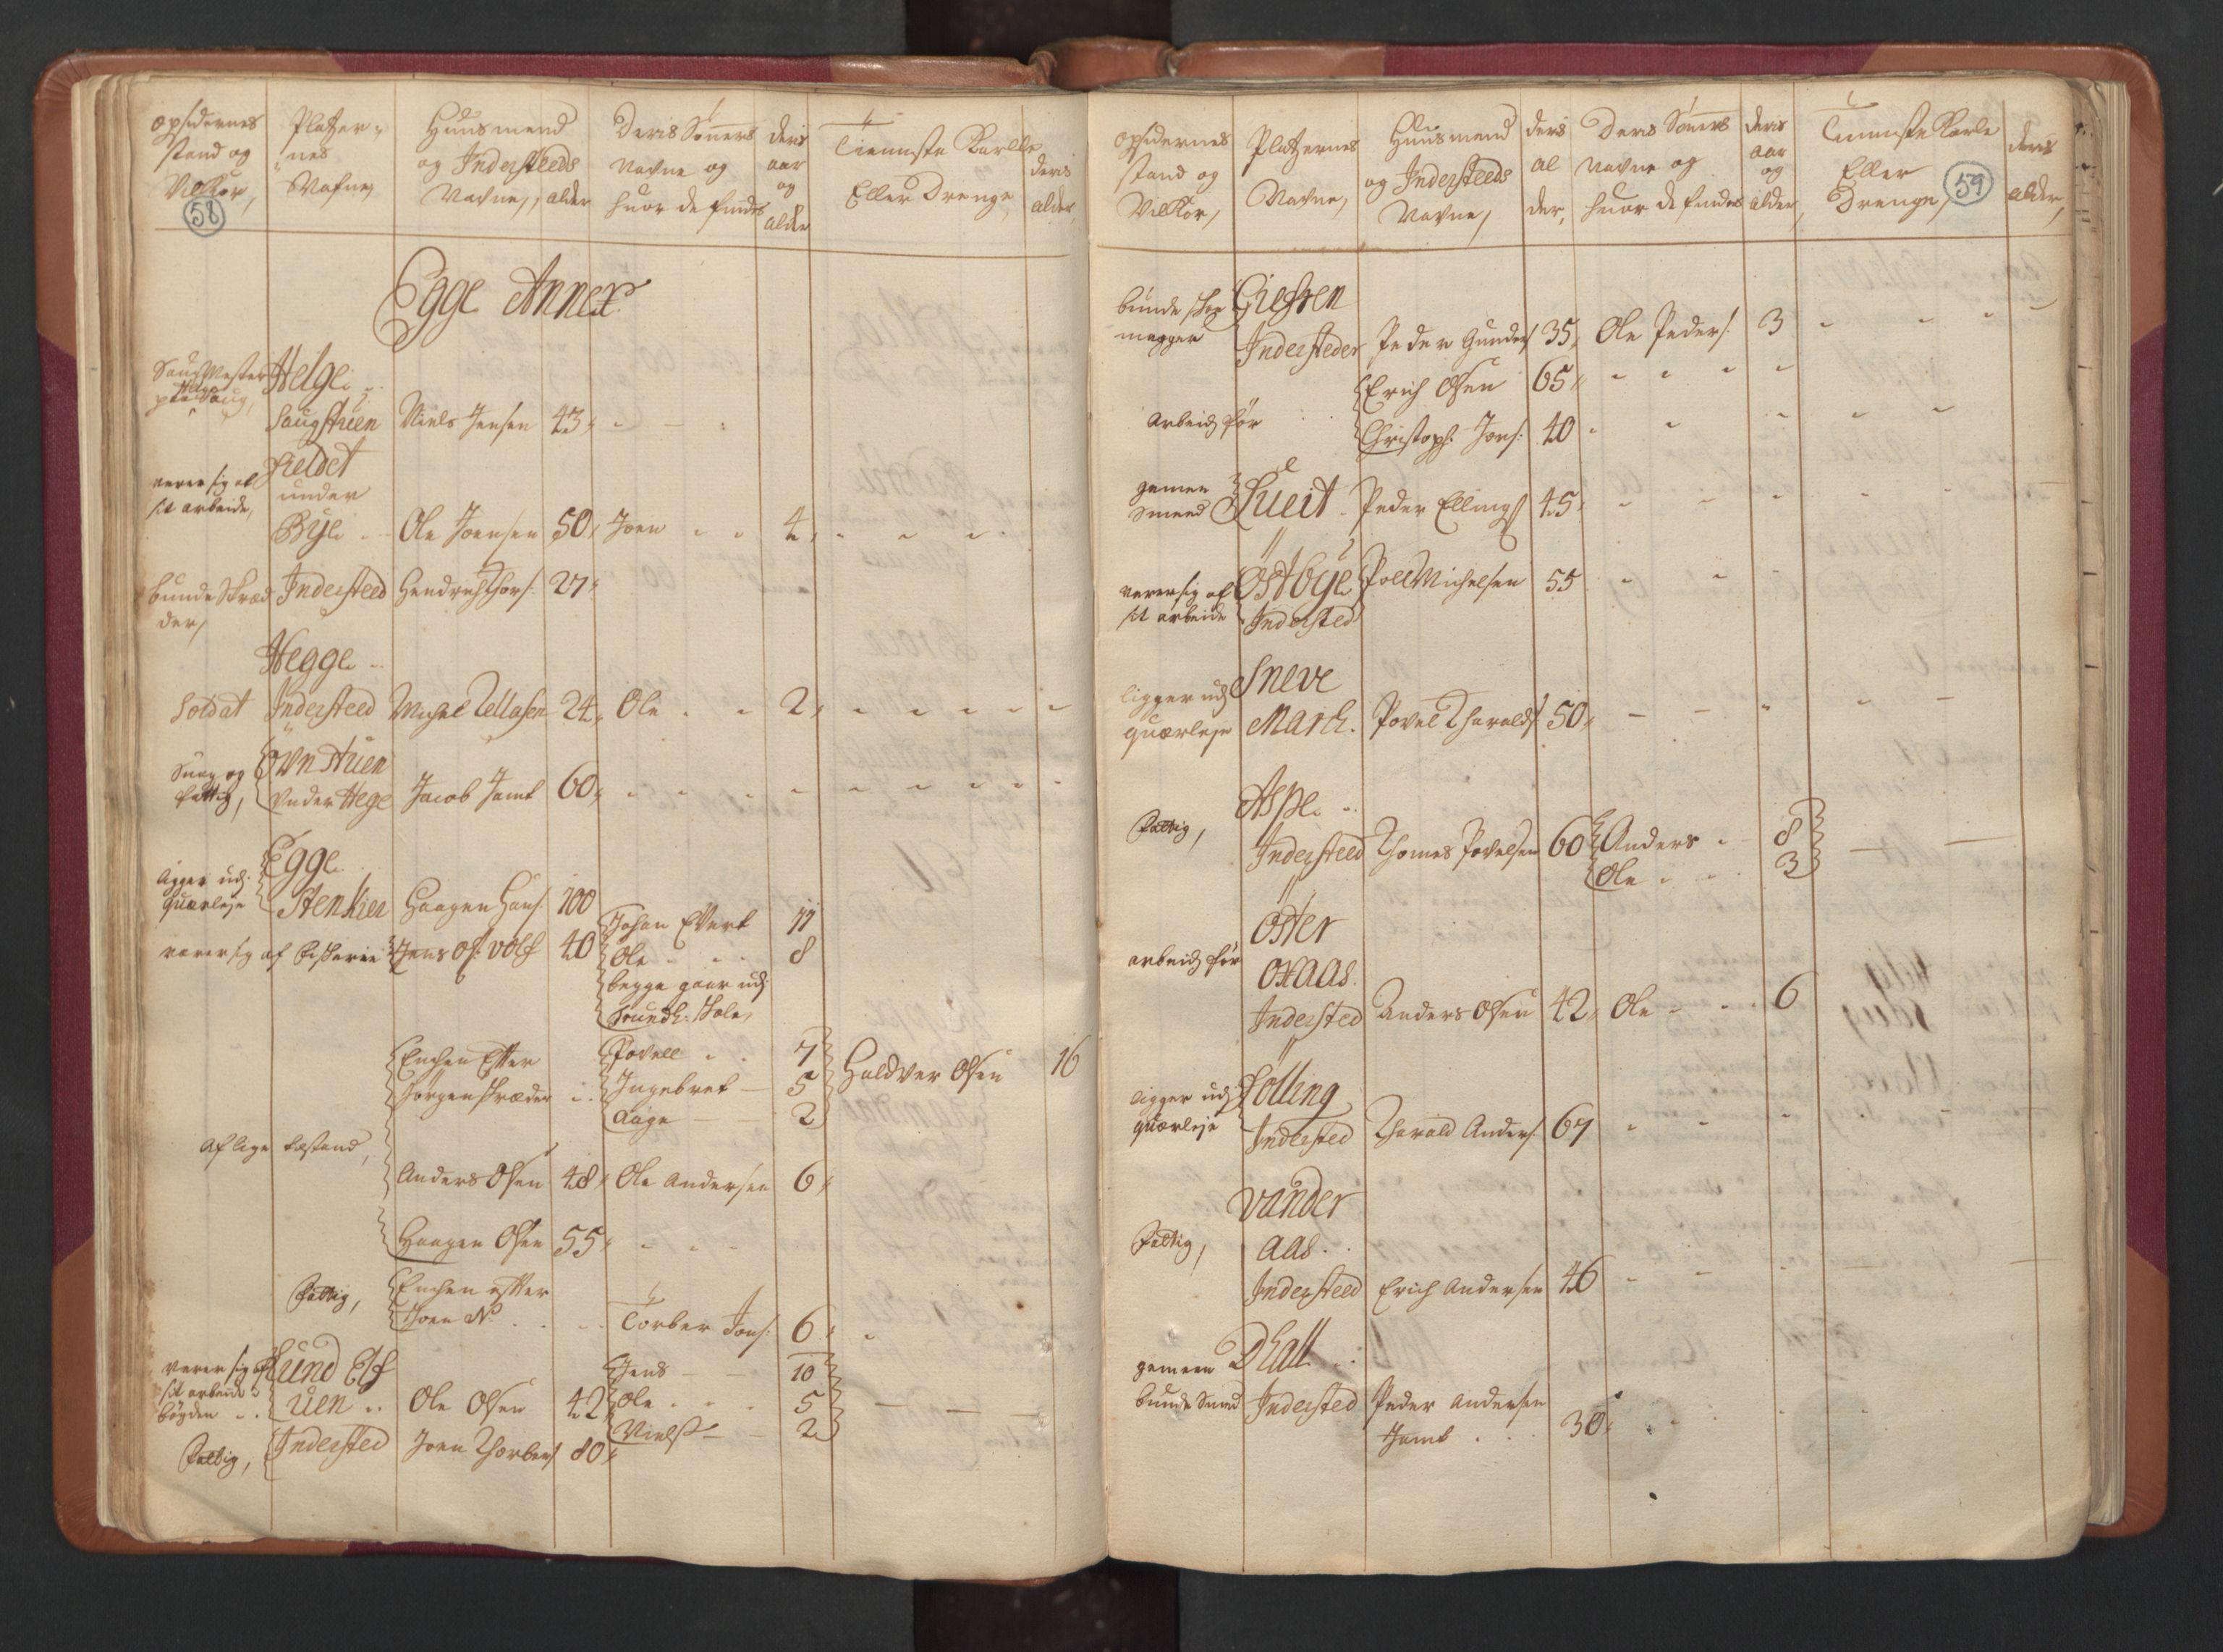 RA, Manntallet 1701, nr. 15: Inderøy fogderi og Namdal fogderi, 1701, s. 58-59